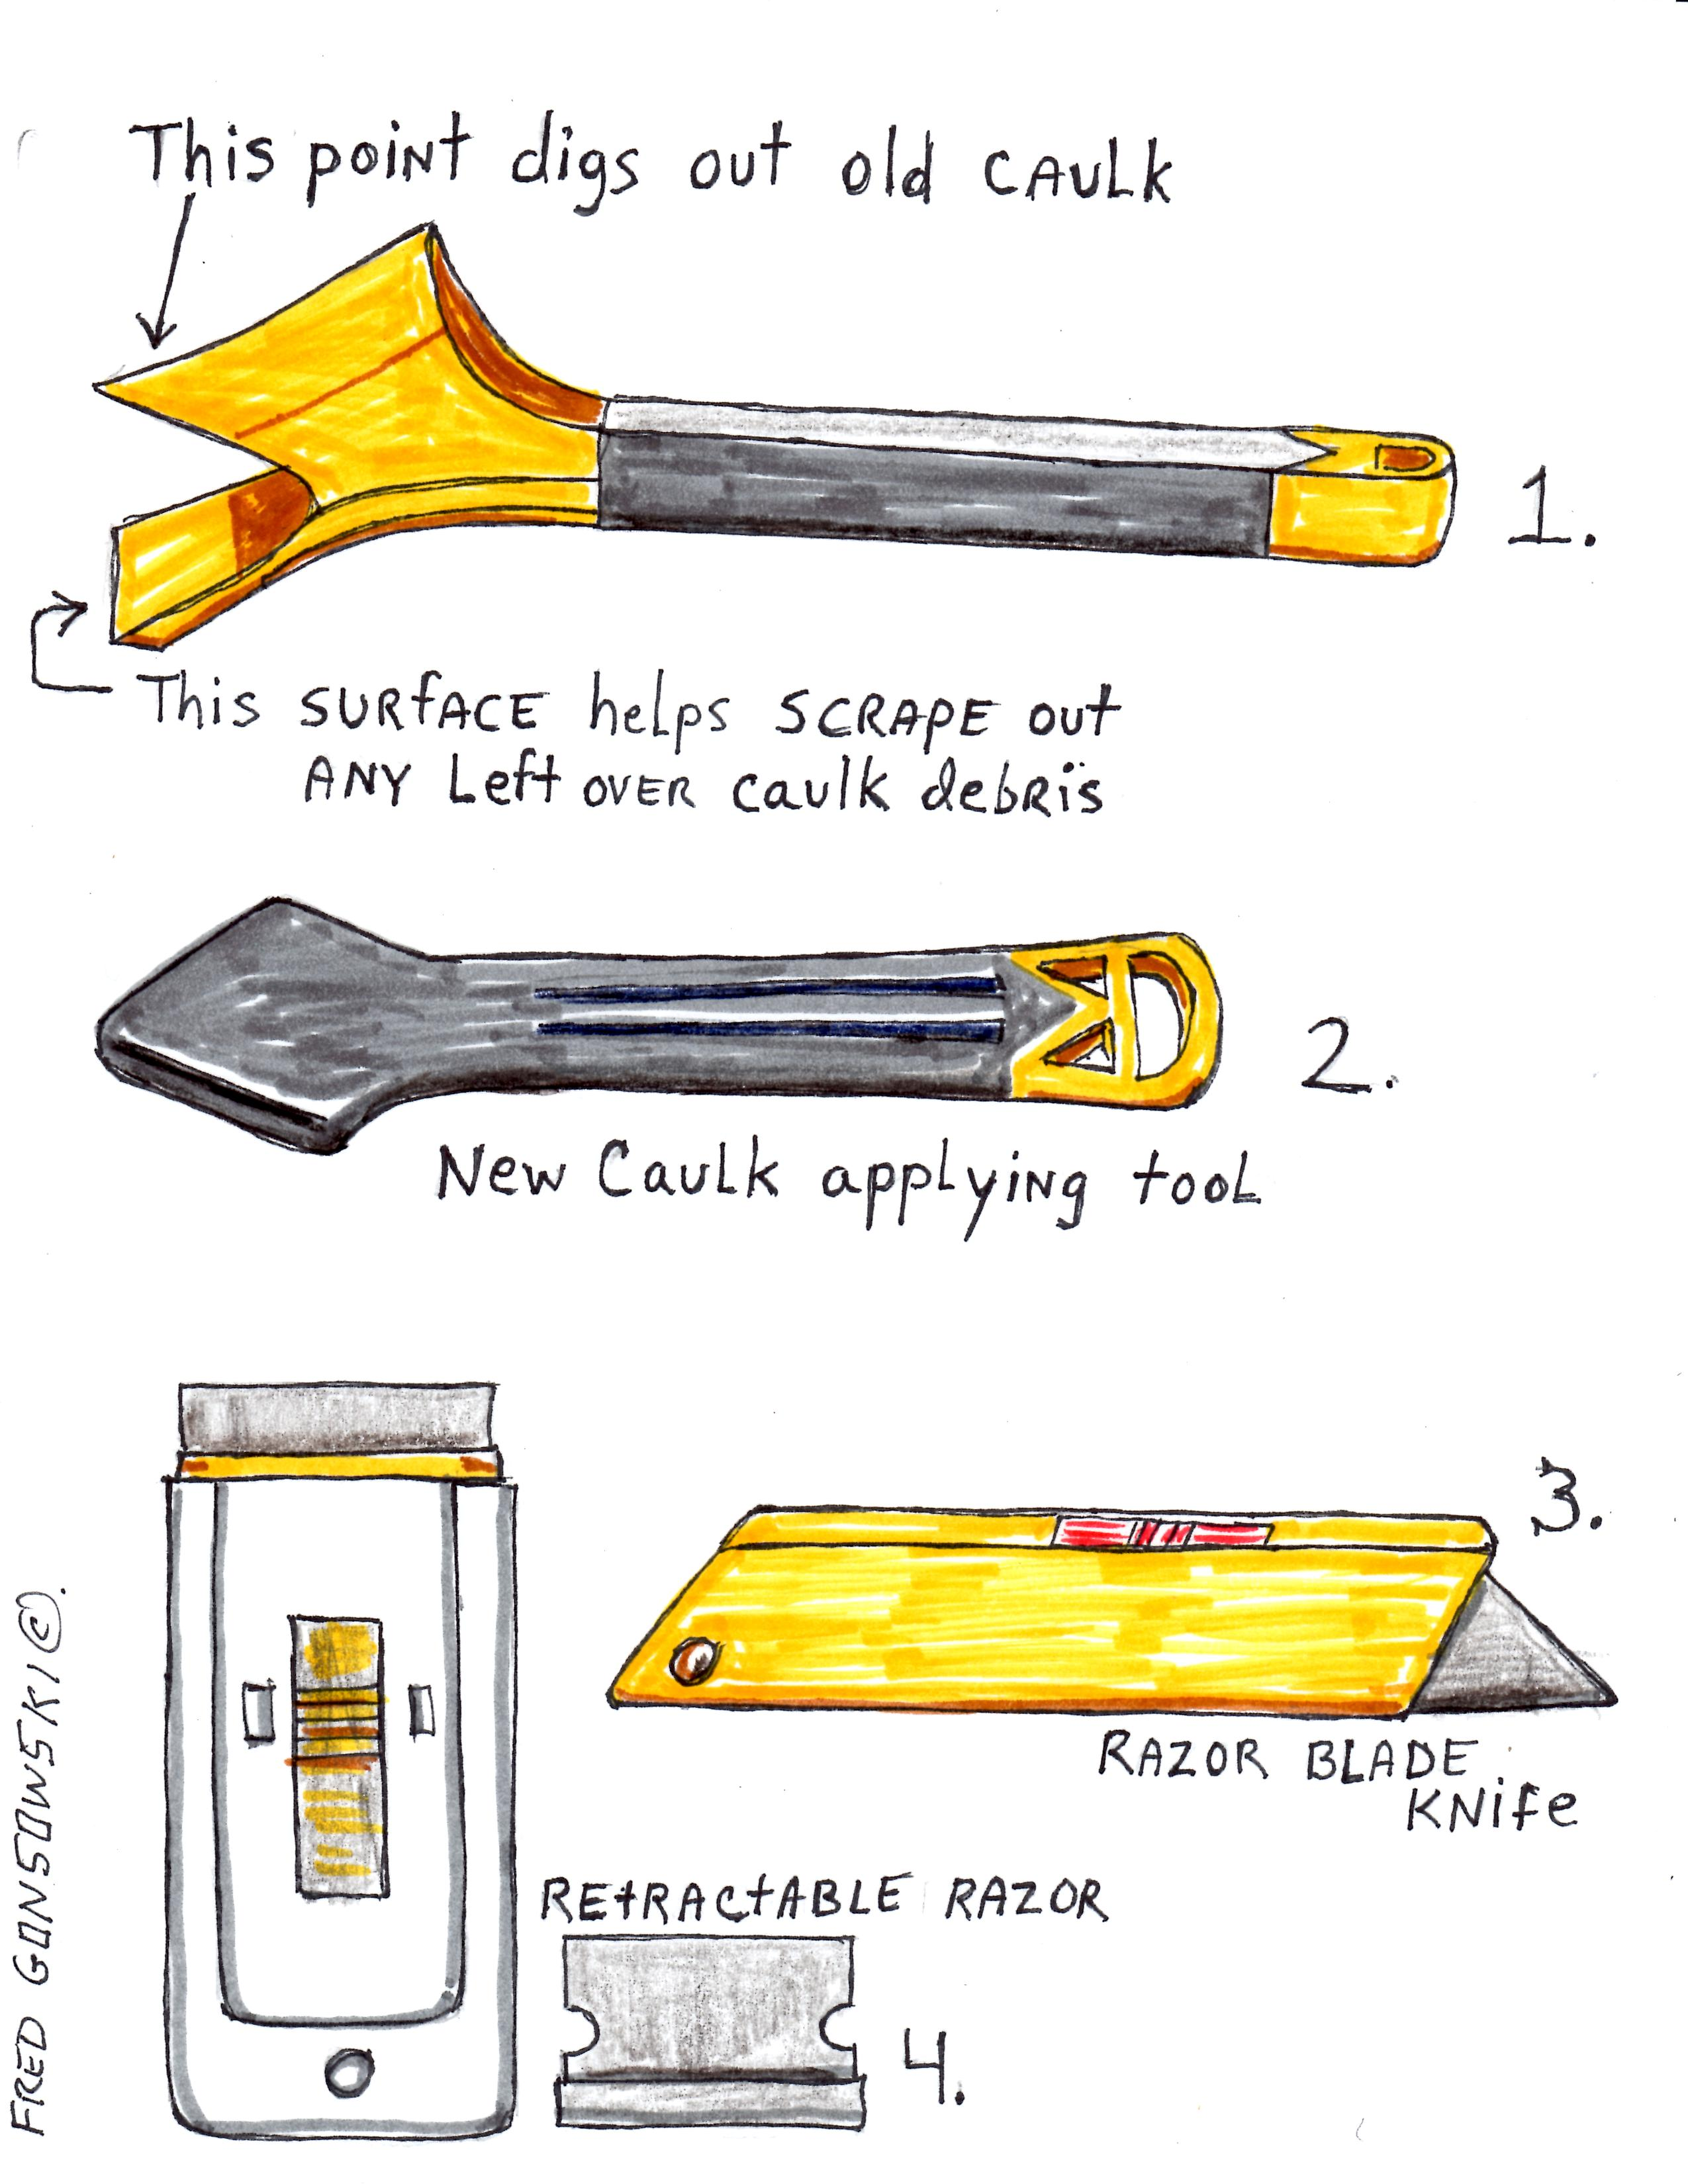 Tools used to remove old caulk and to caulk a bath tub